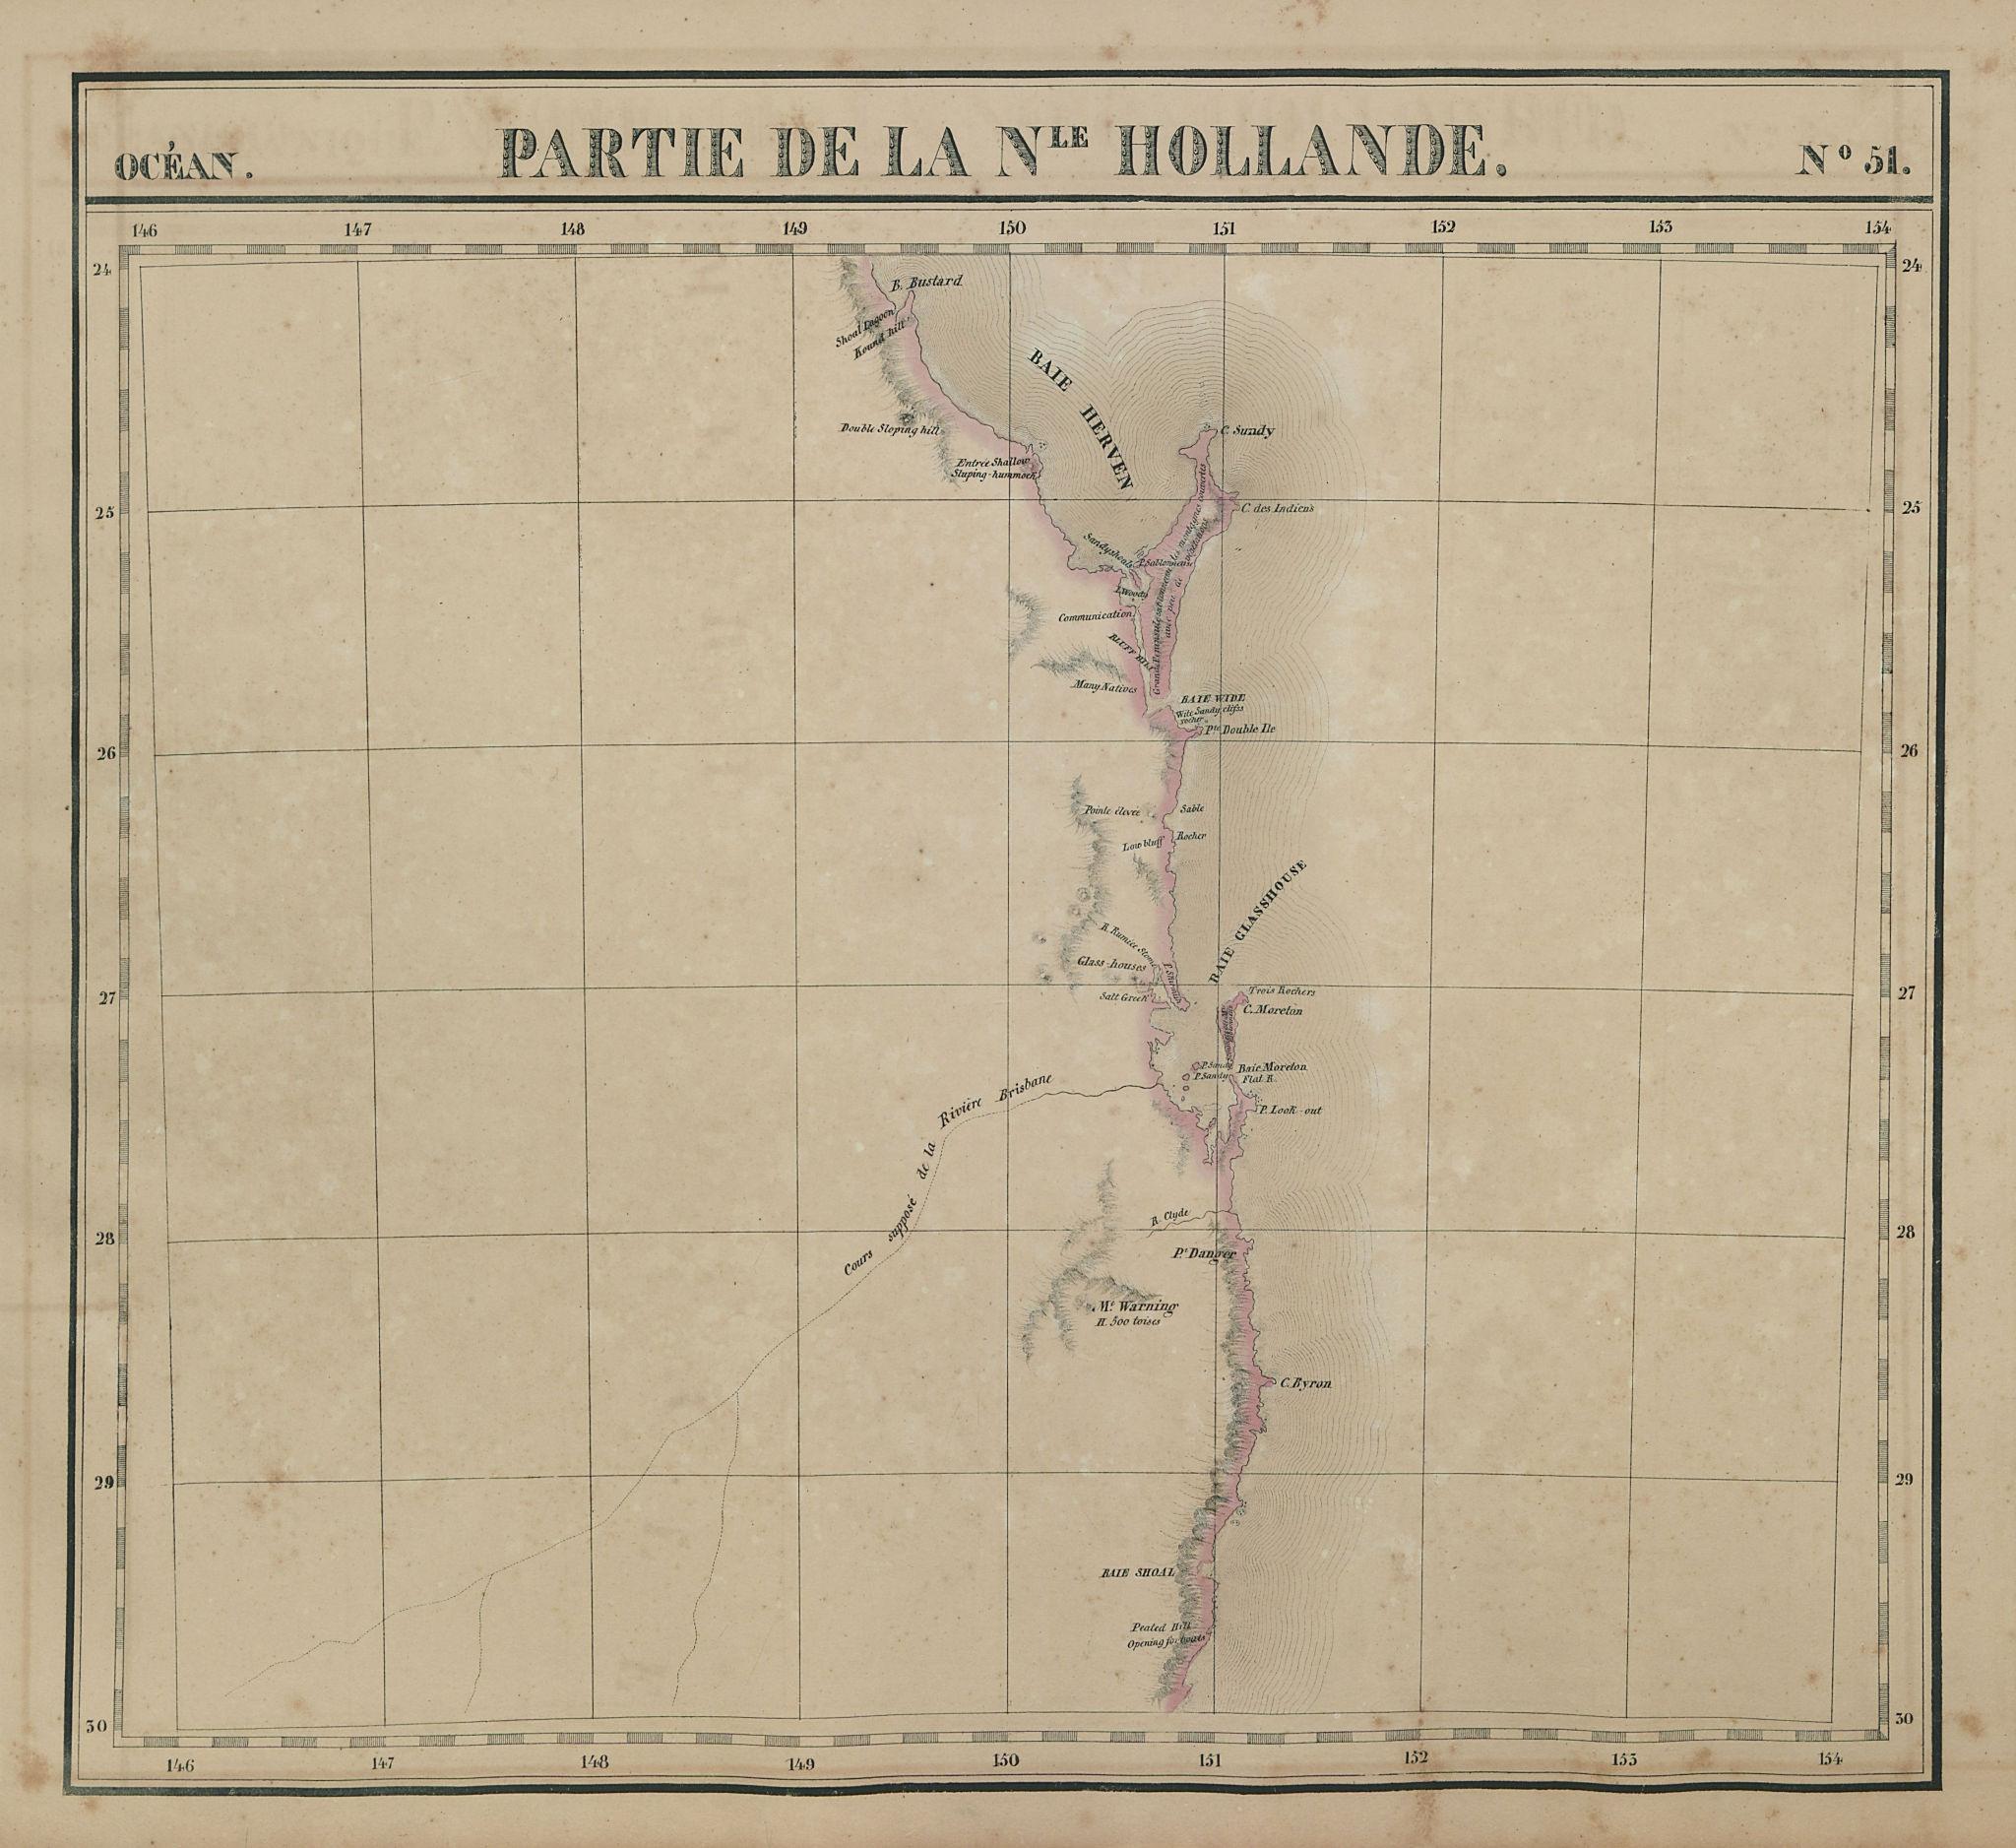 Océanique. Partie… Nle Hollande #51. Queensland NSW coast. VANDERMAELEN 1827 map